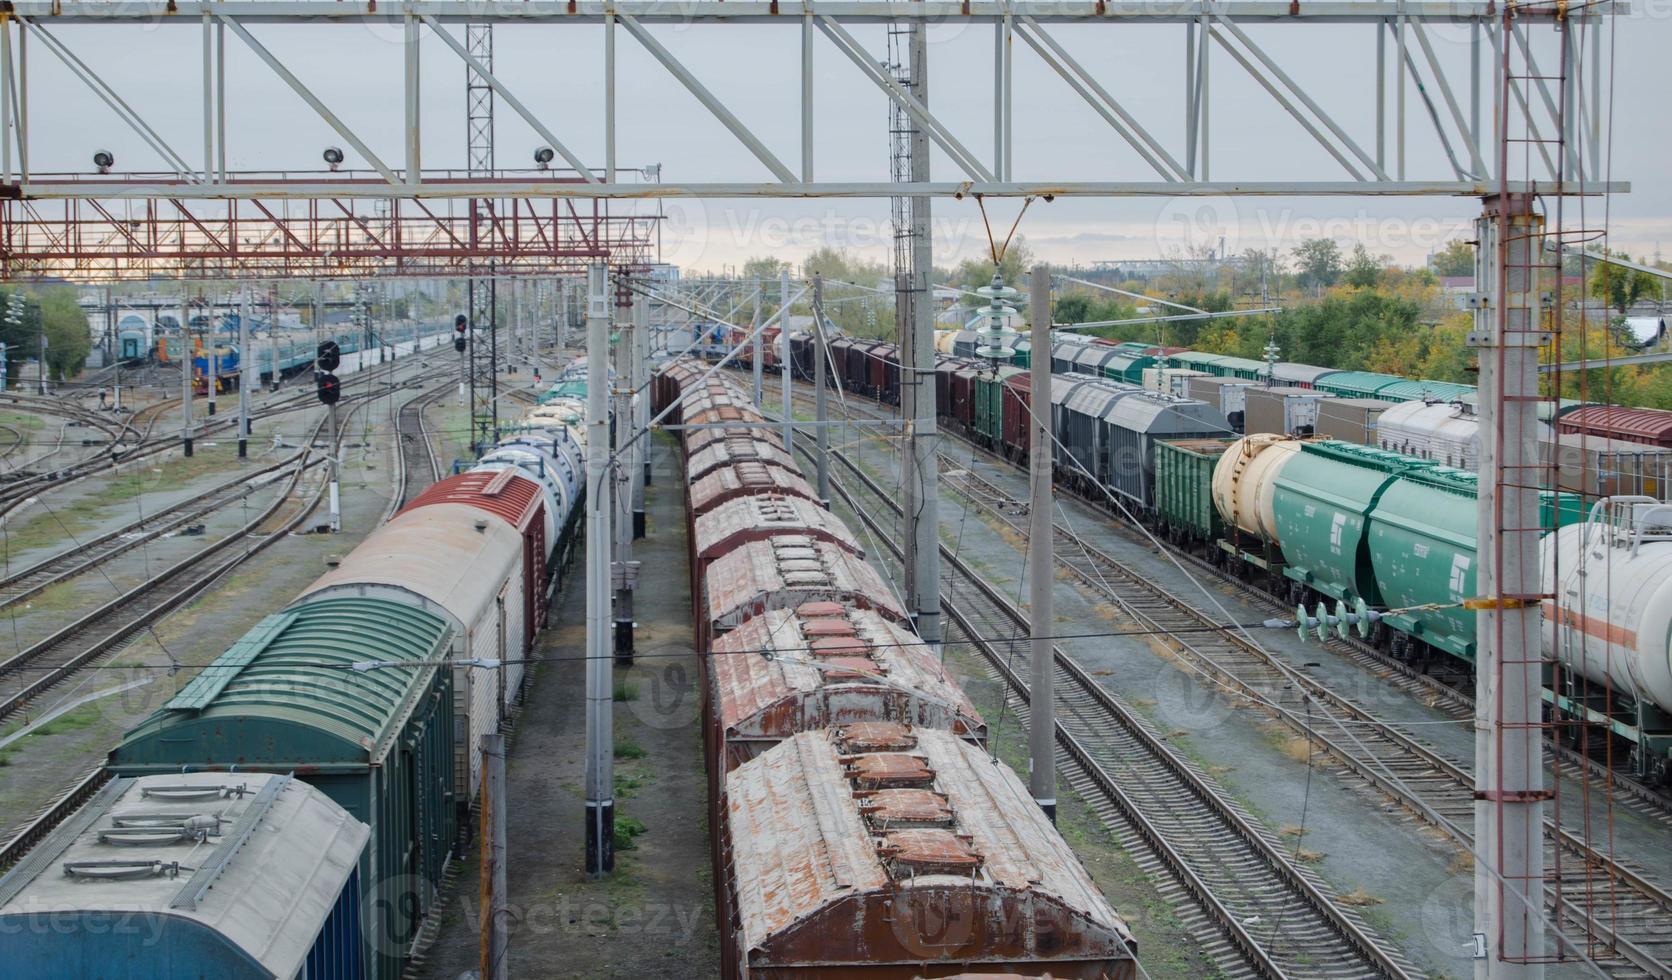 Eisenbahnstation foto